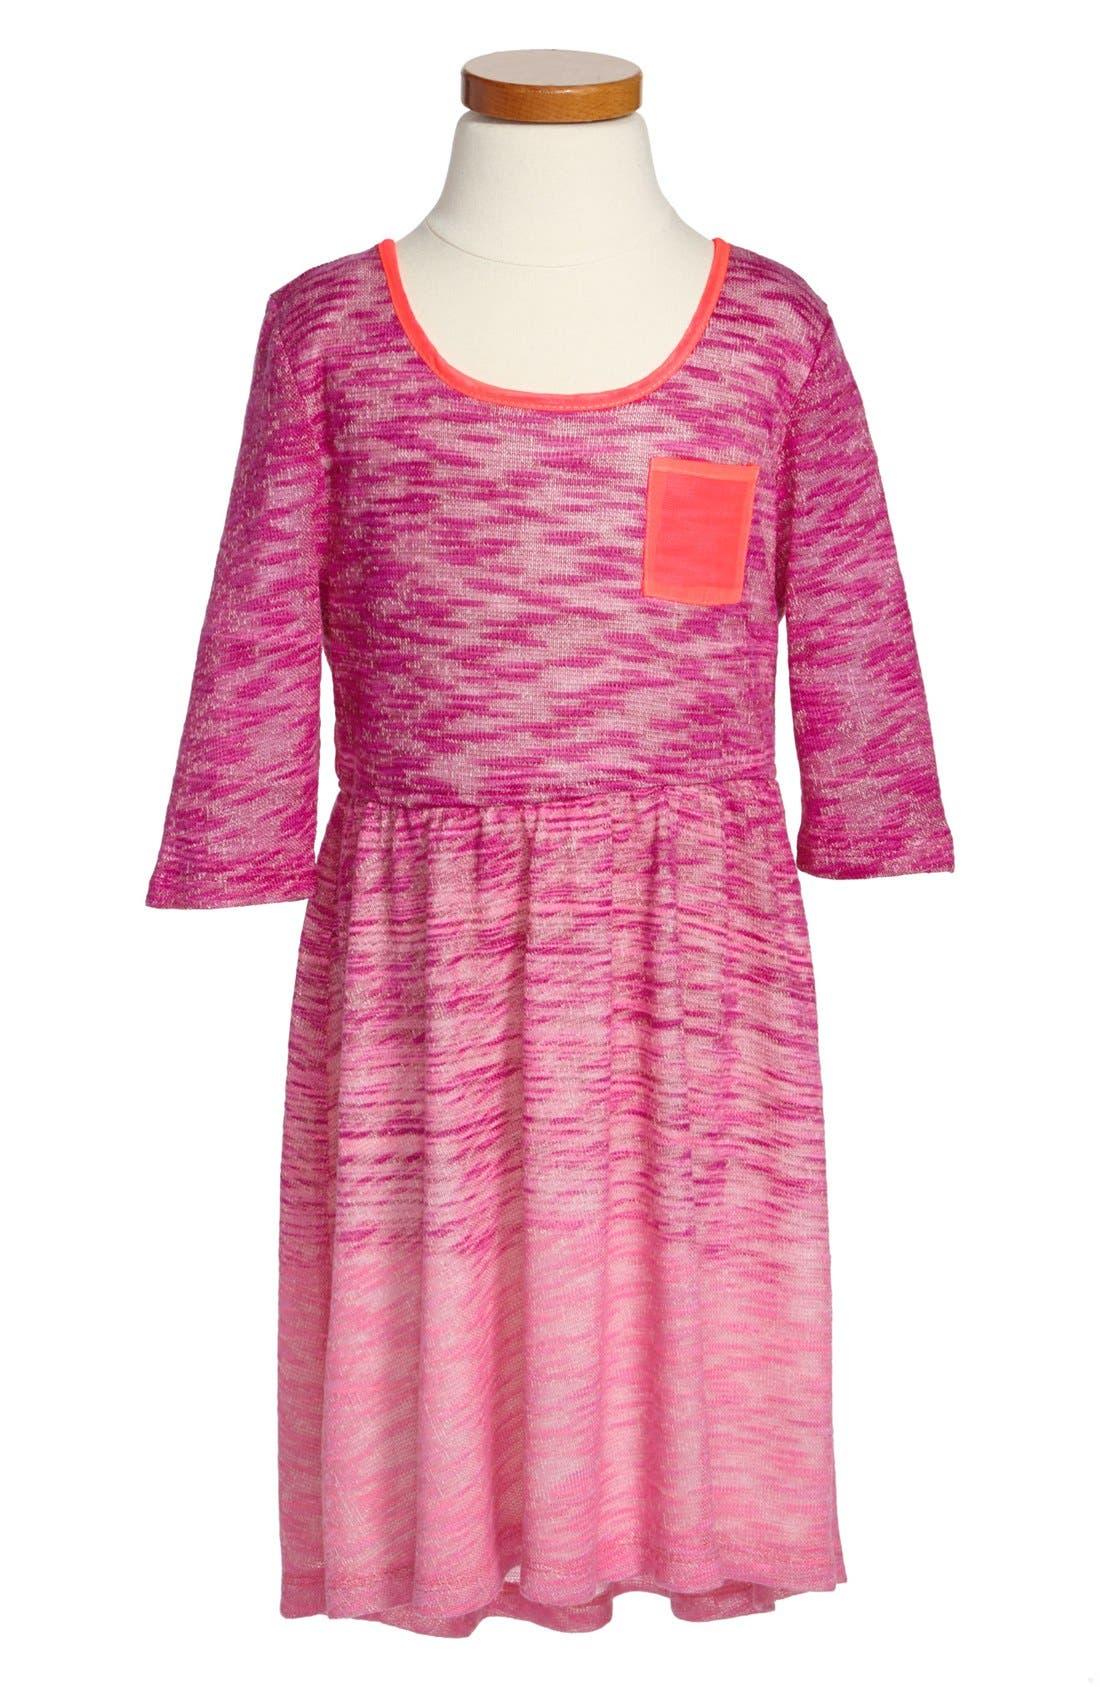 Alternate Image 1 Selected - W Girl Patch Pocket Ombré Dress (Little Girls & Big Girls)